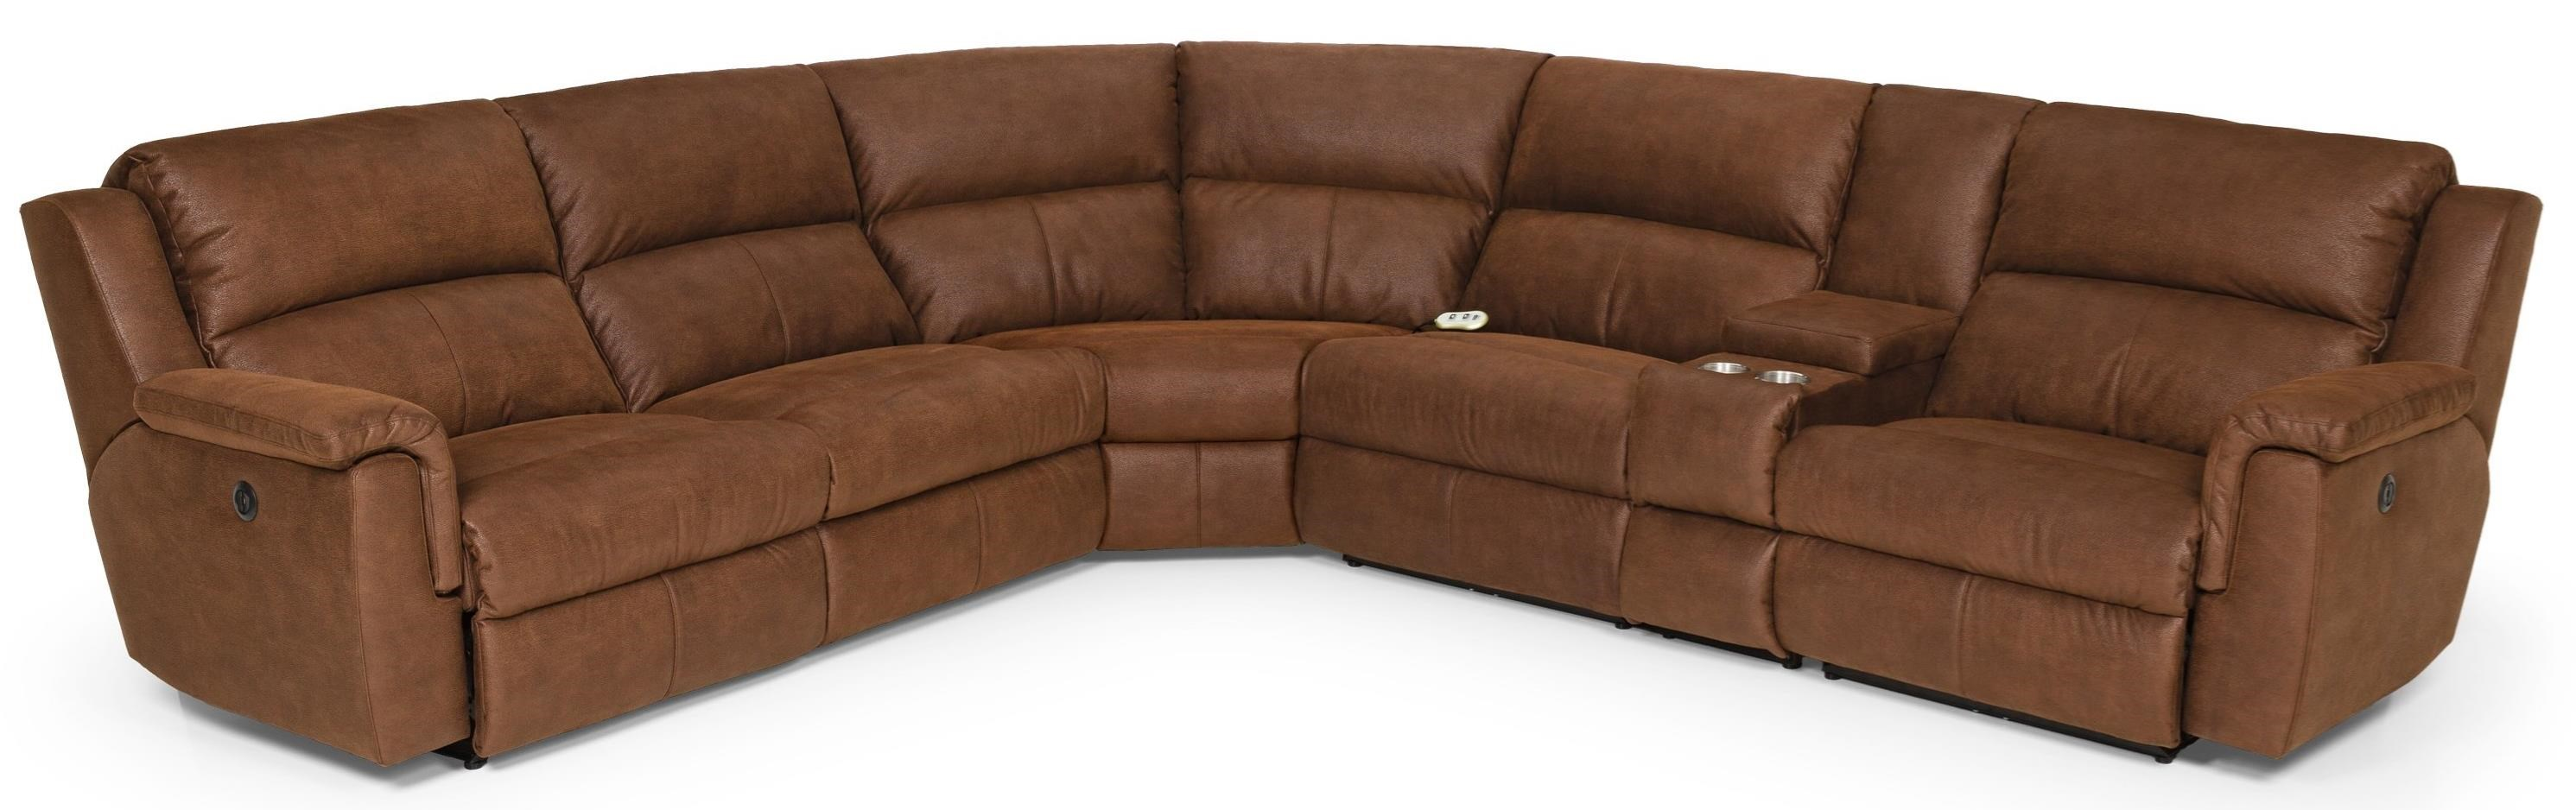 ikea ektorp sectional sofa Sofa Hpricot